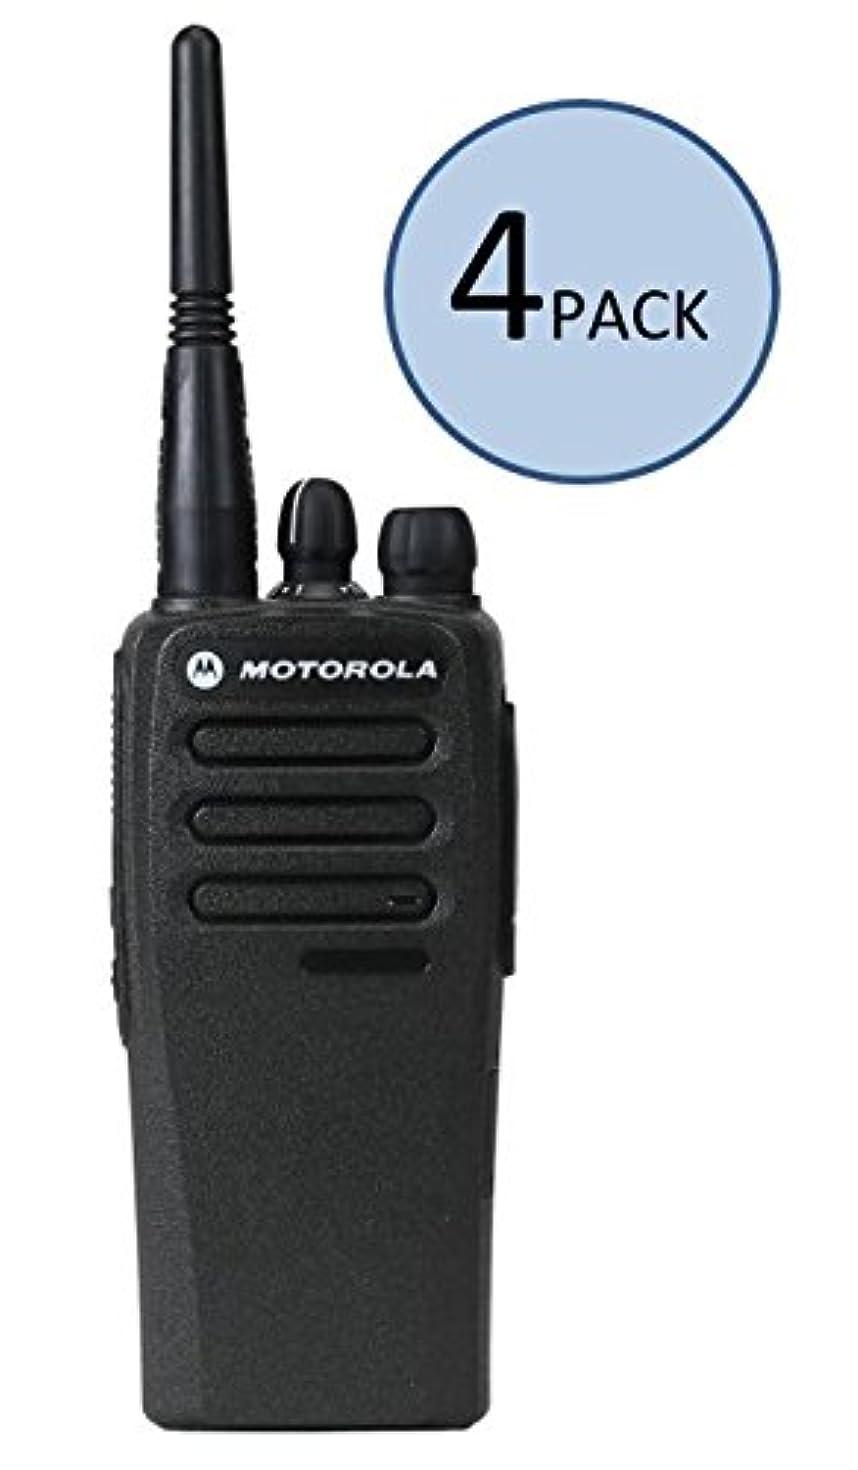 4 Pack of Motorola CP200d UHF Two Way Radios